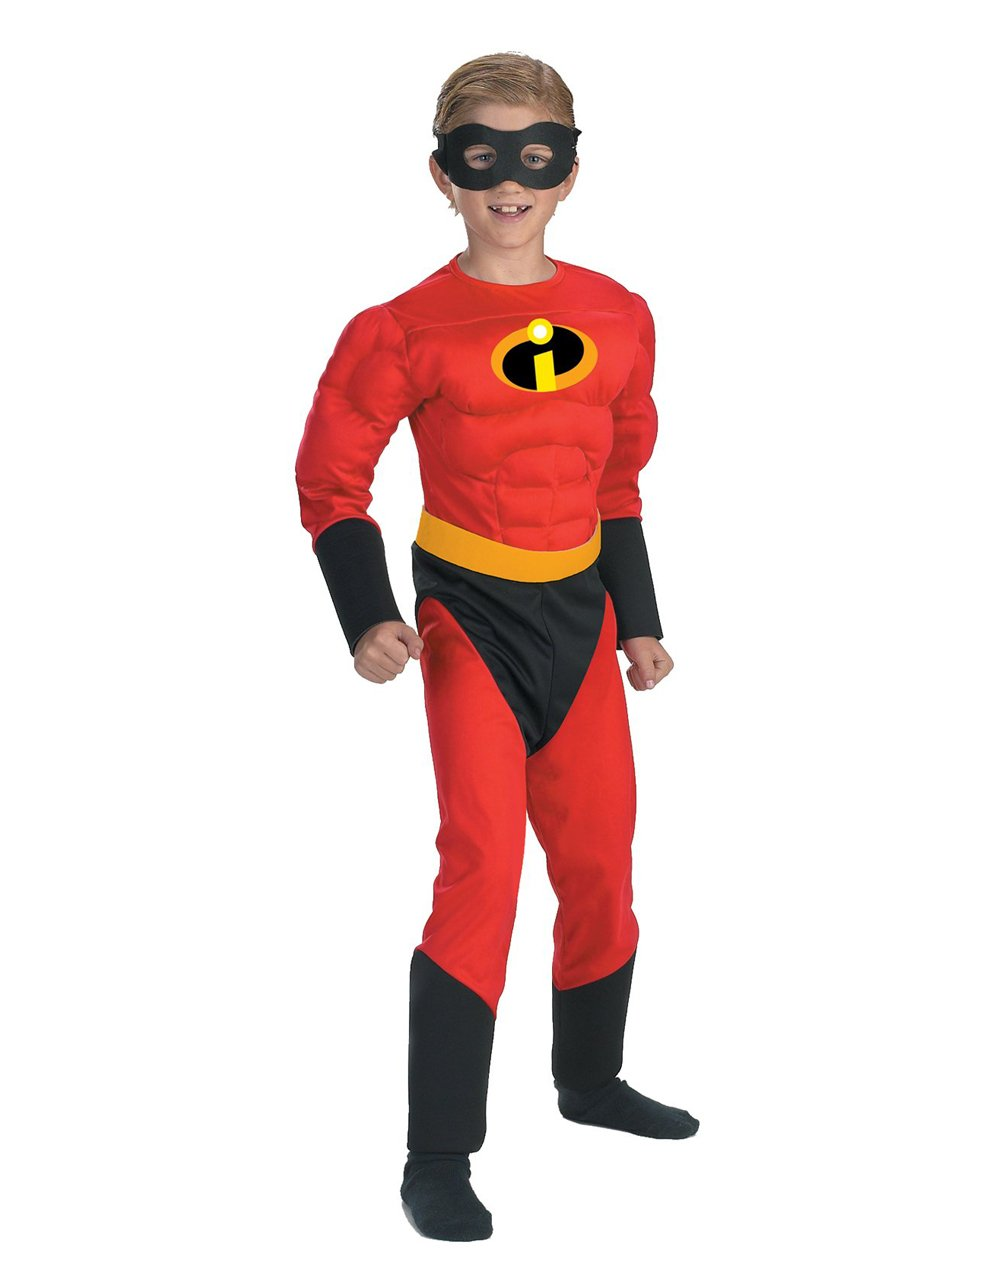 Incredibles Dash Costume Incredibles Costume Kids Dash